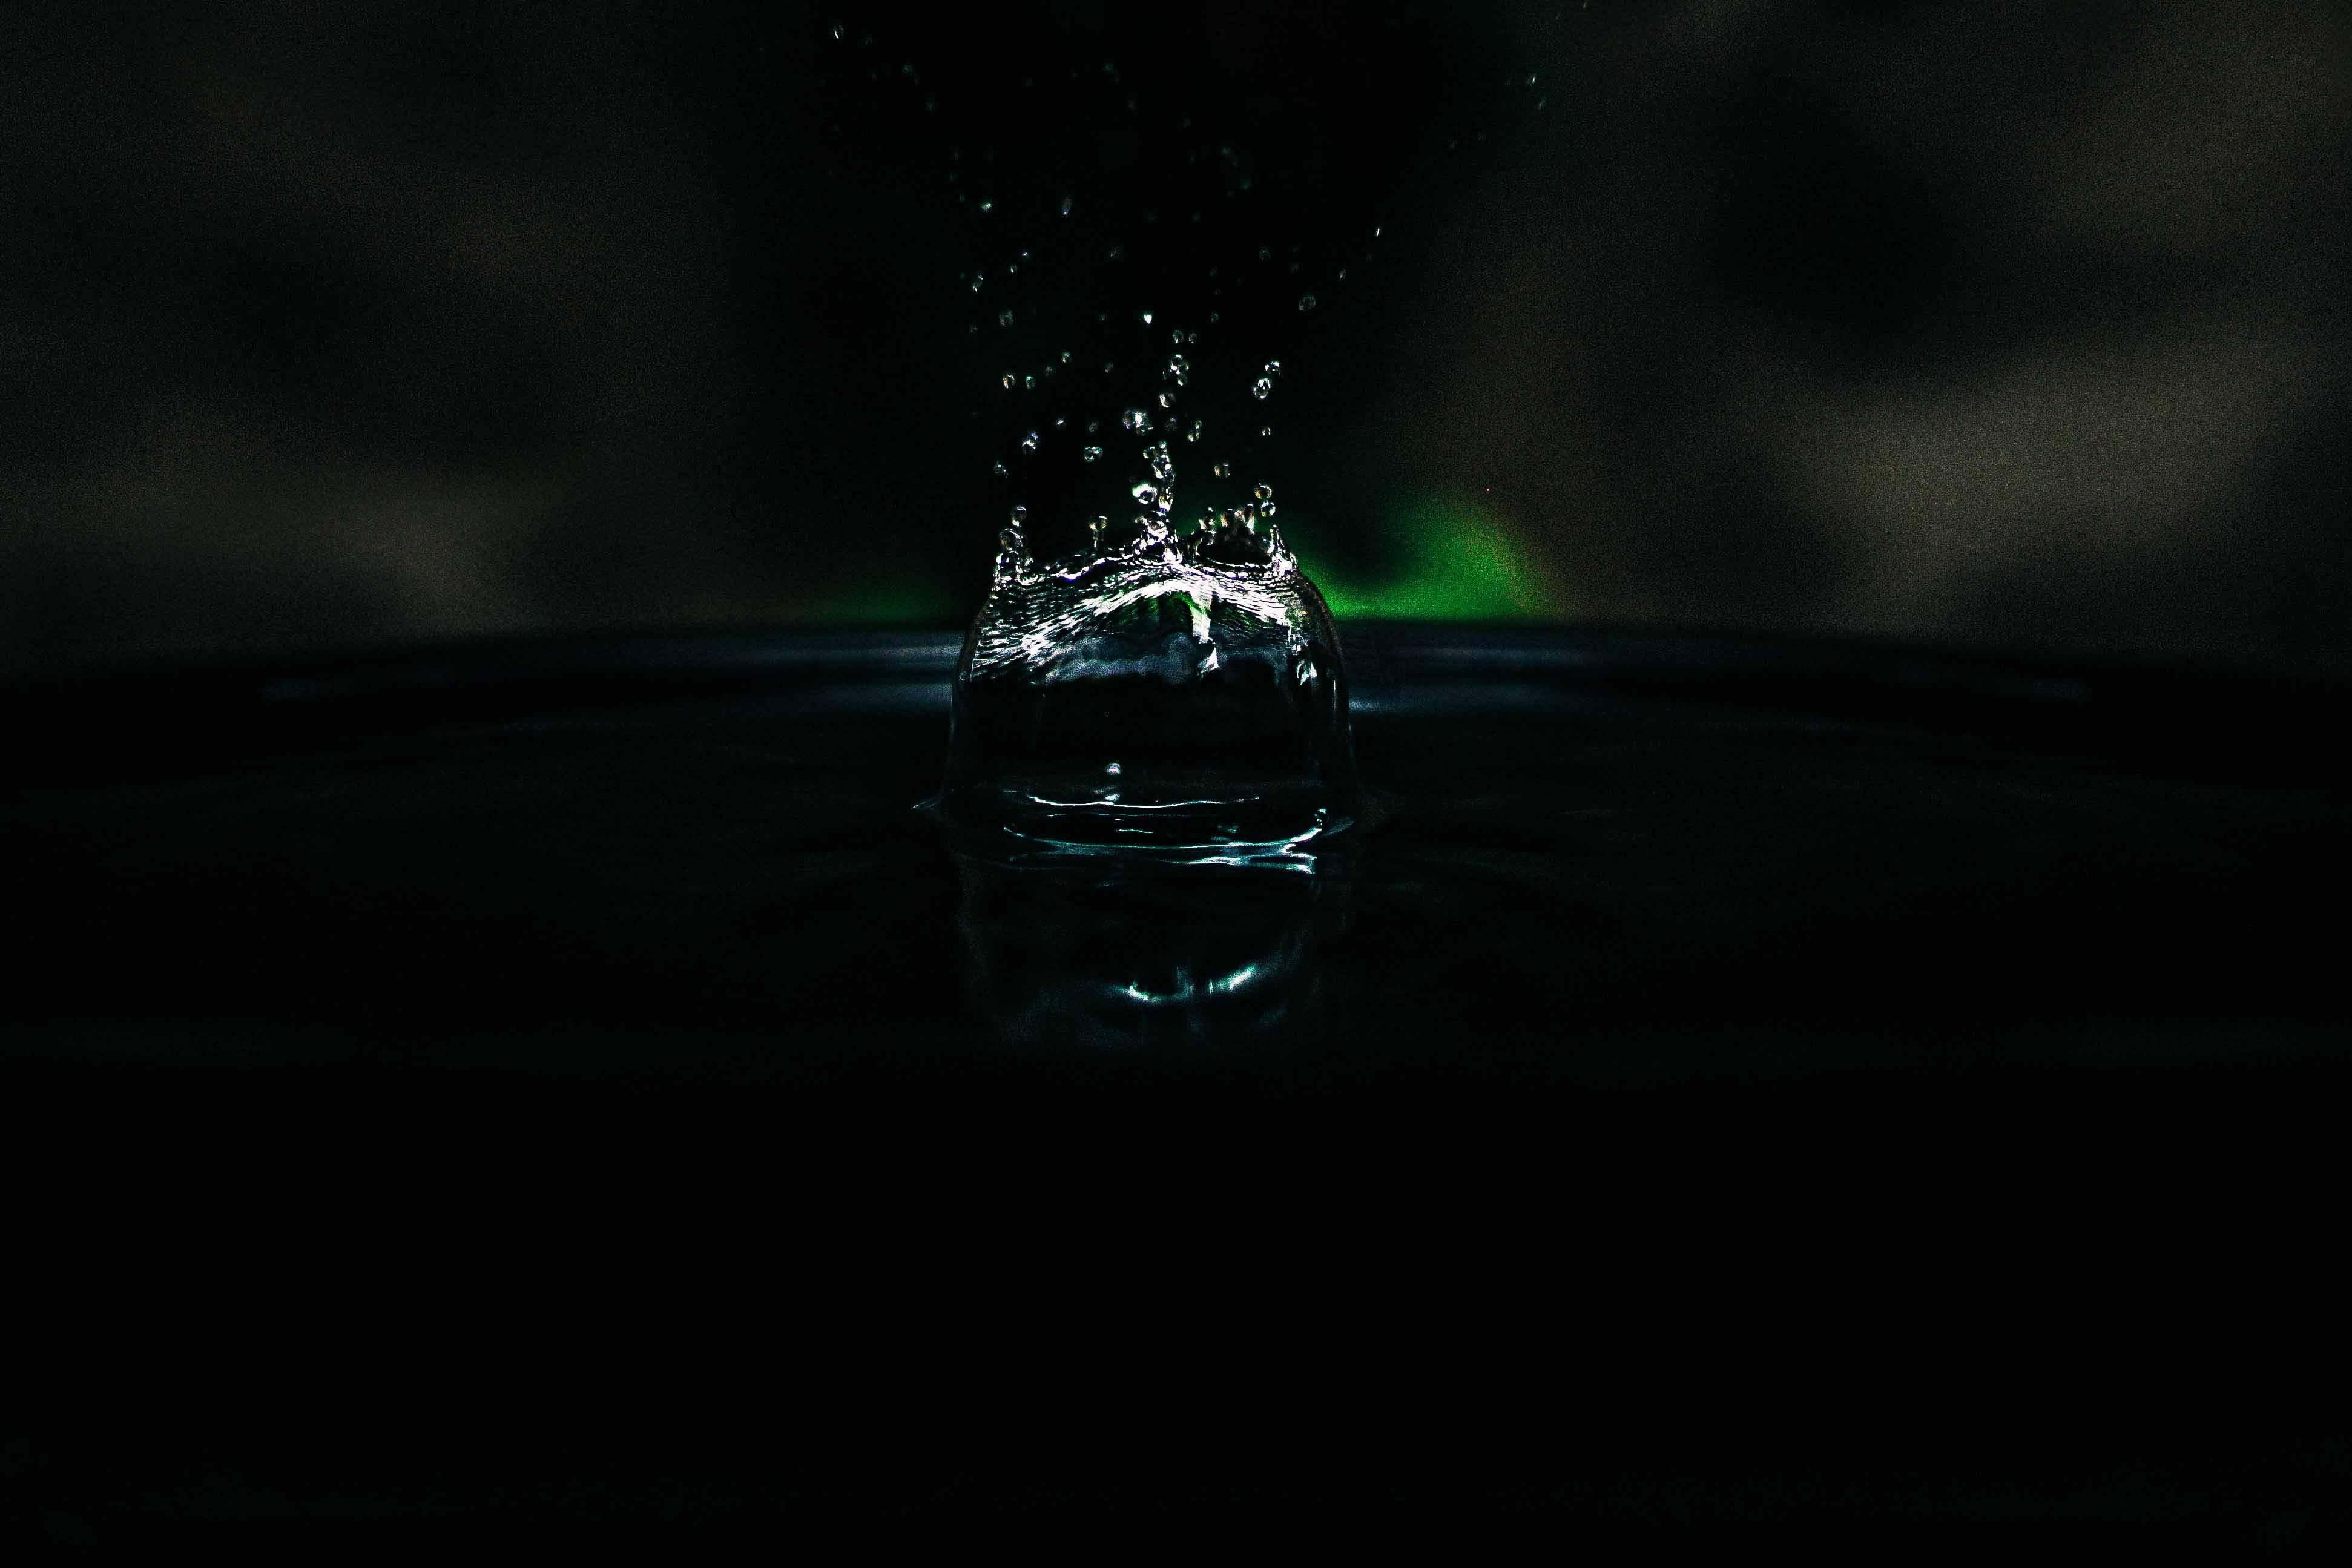 Animal splashes in still water causing ripples